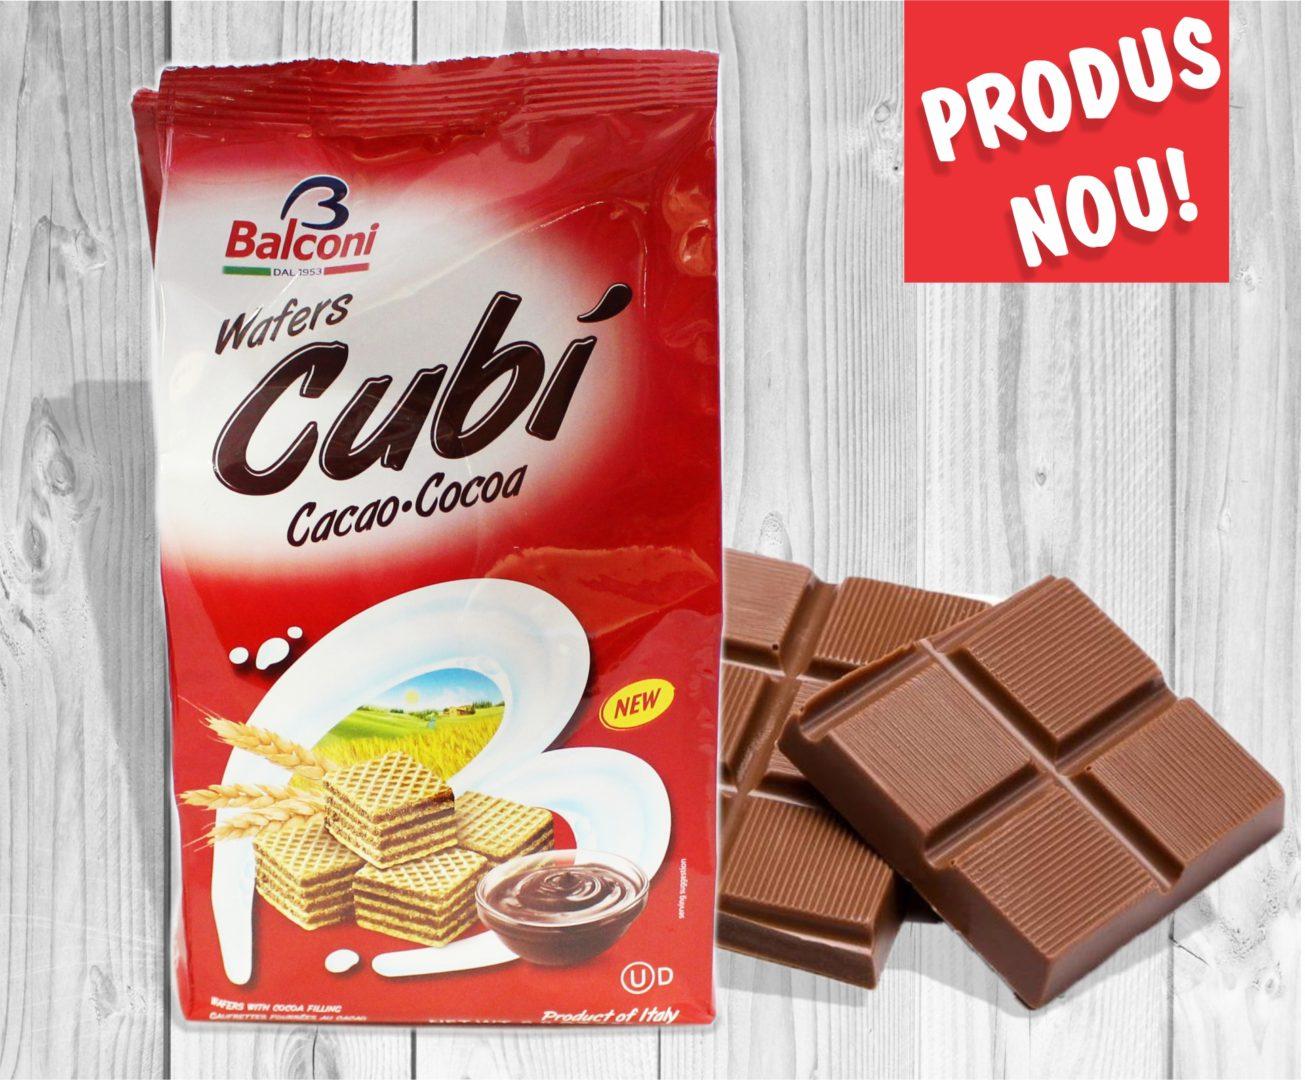 Balconi cubi cacao